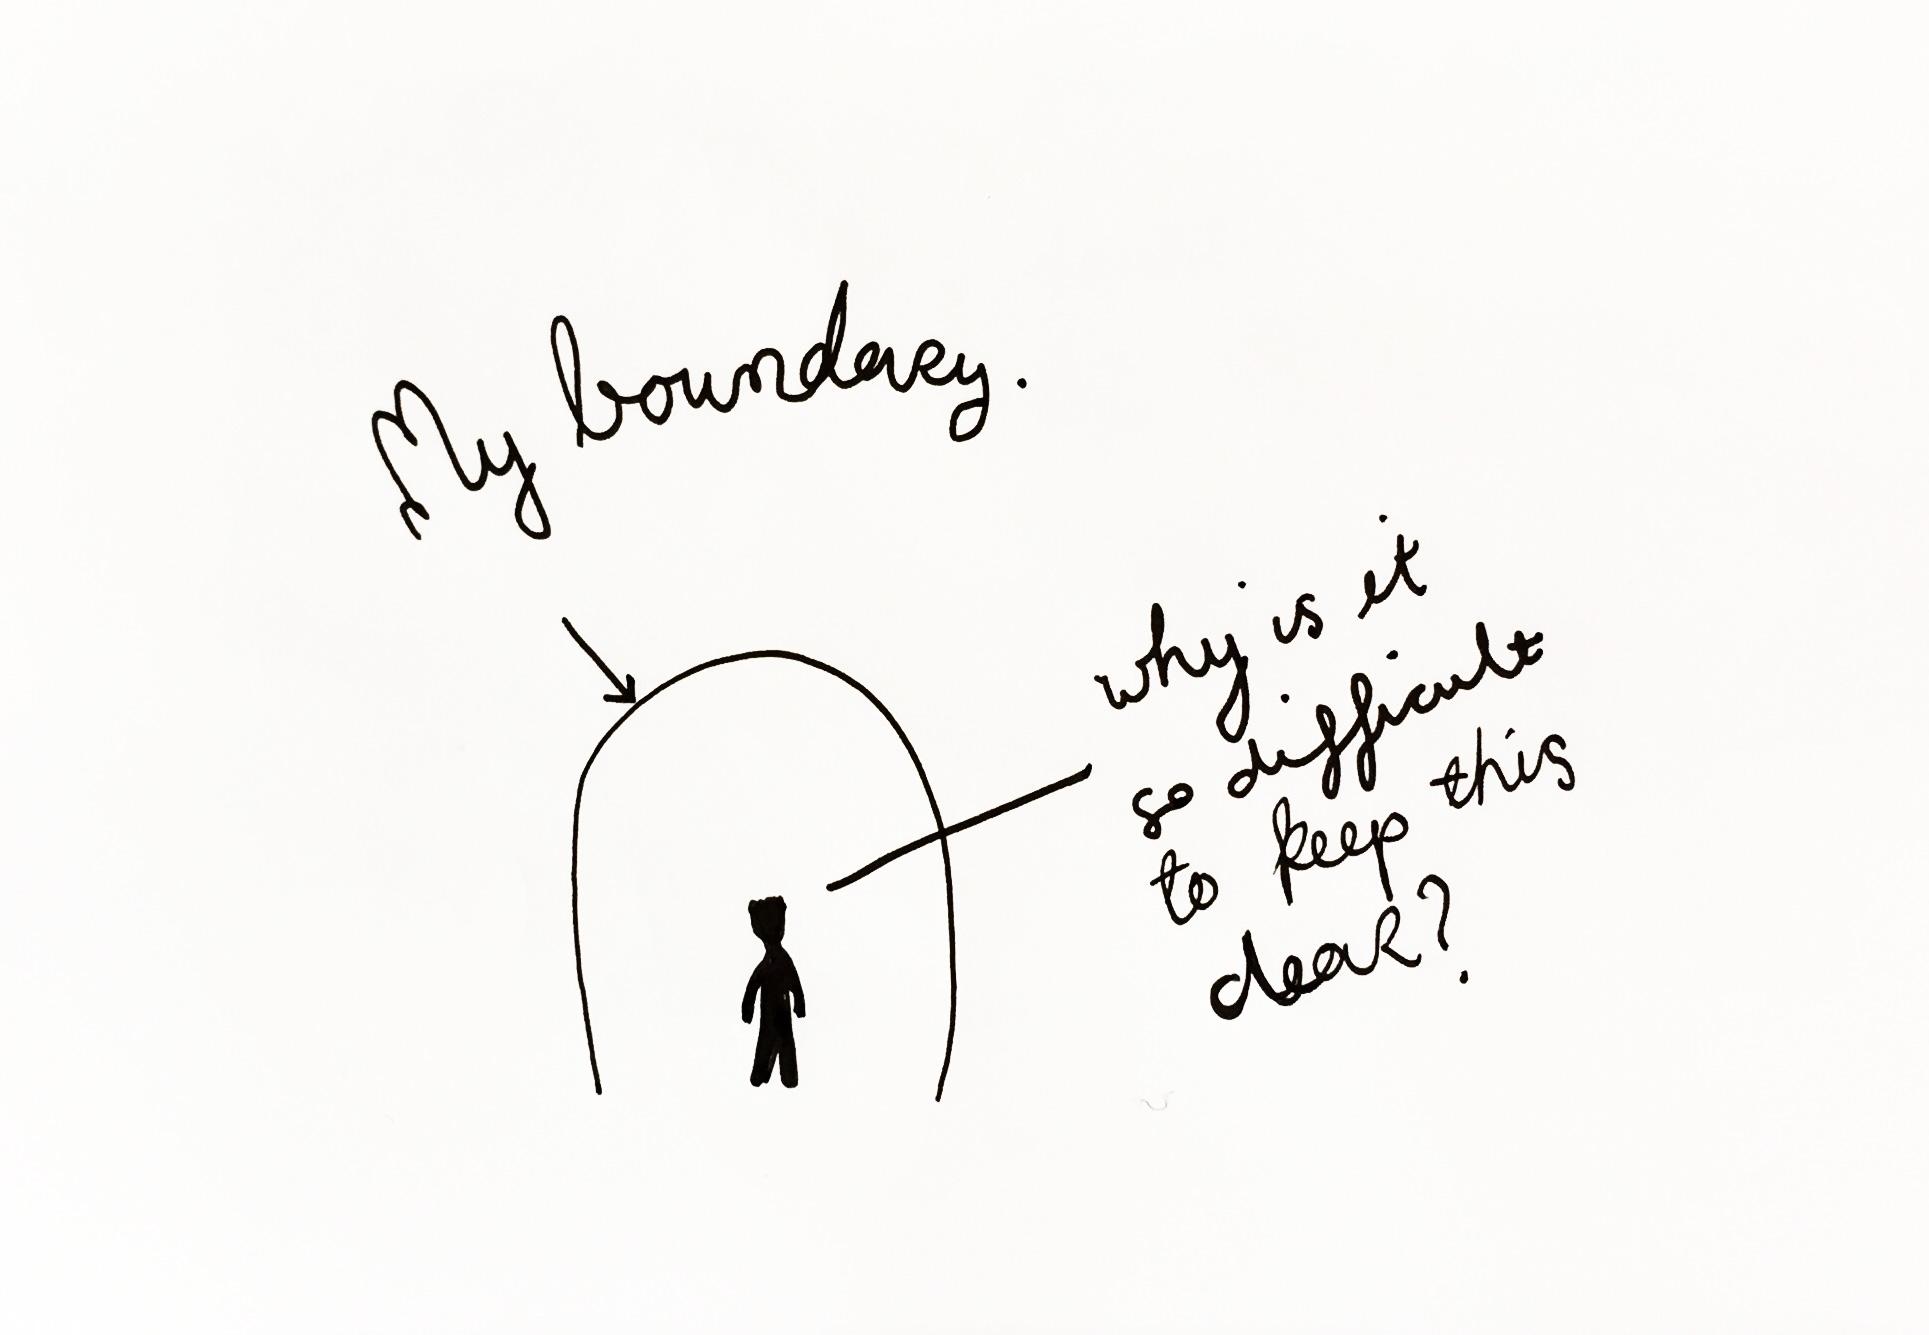 My boundary. Drawing Luke Hockley.